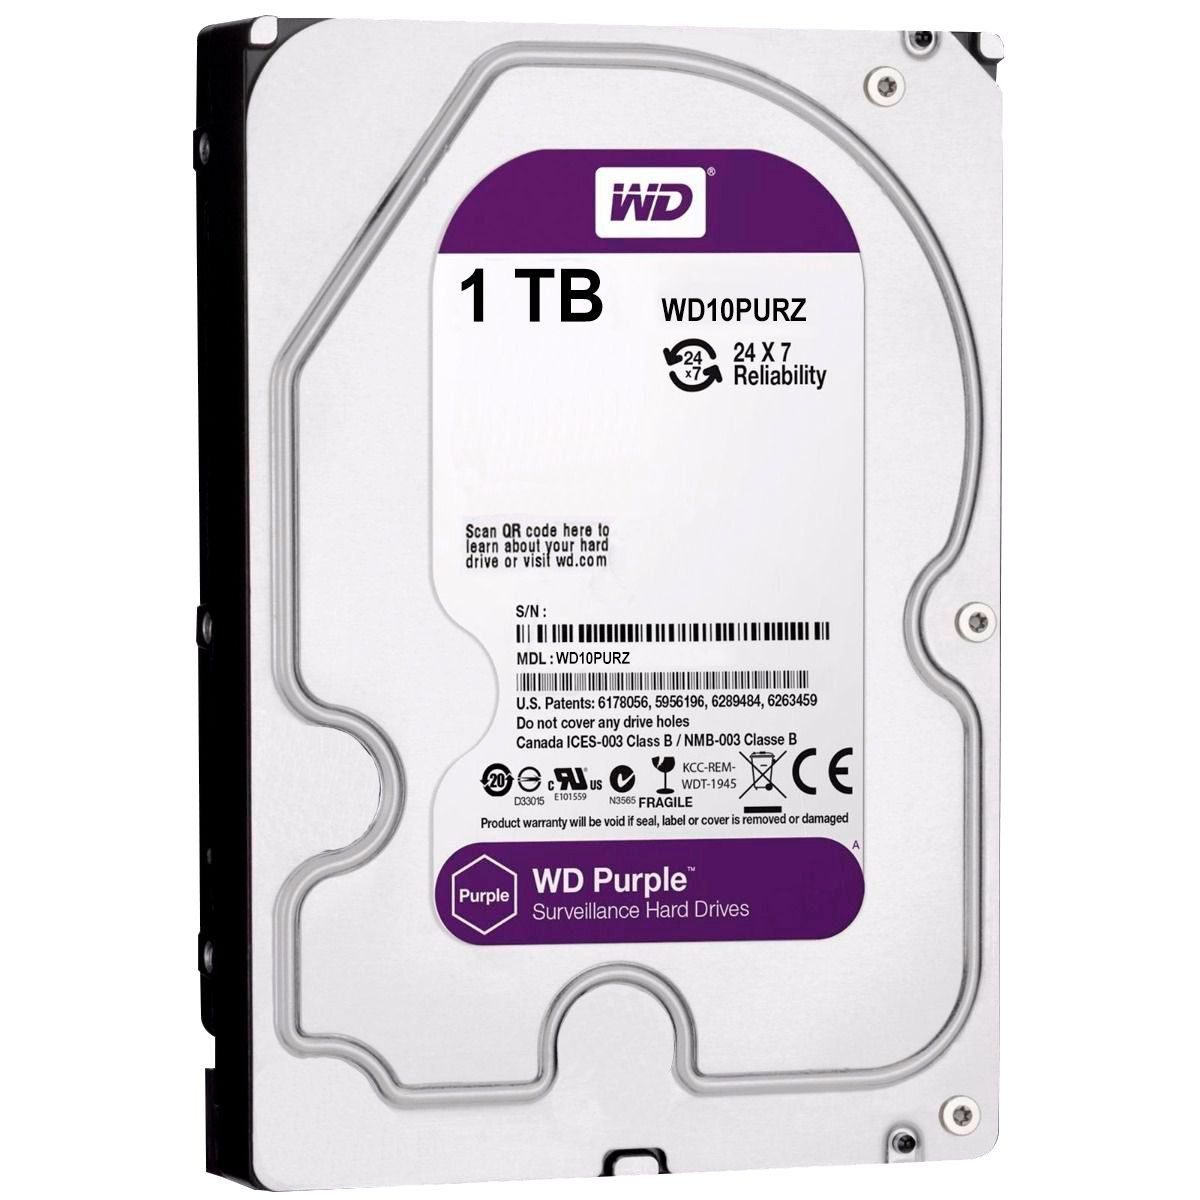 Kit 8 Câmeras de Segurança HD 720p Intelbras VHD 3130 B G5 + DVR Multi HD + HD 1TB + Acessórios